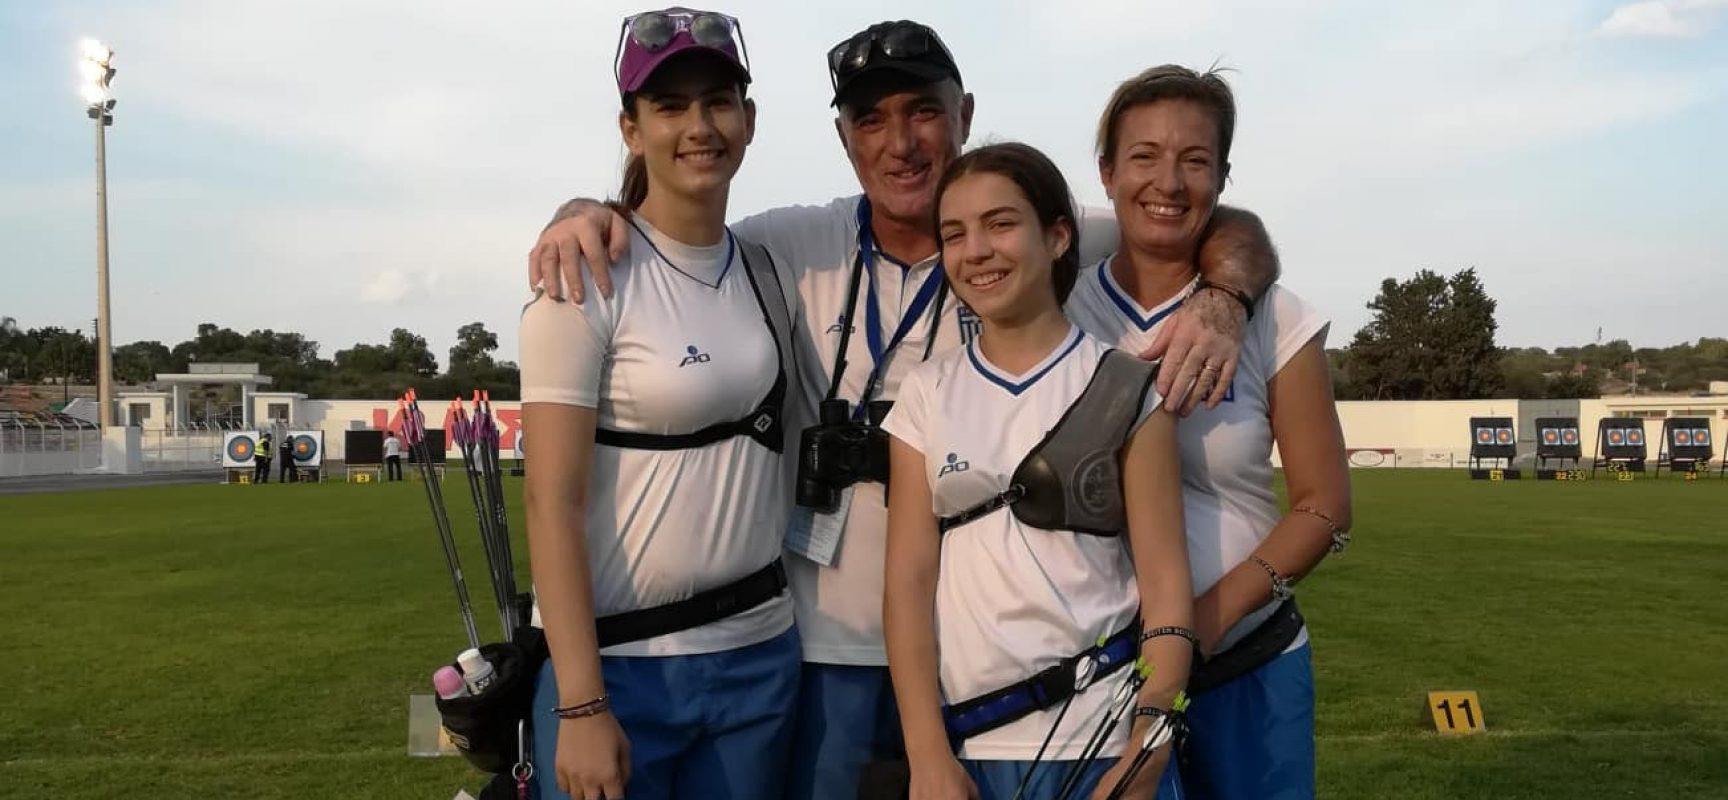 H Eλλάδα κατέκτησε 4 μετάλλια στην πρώτη μέρα του «Aphrodite Mediterranean Cup»